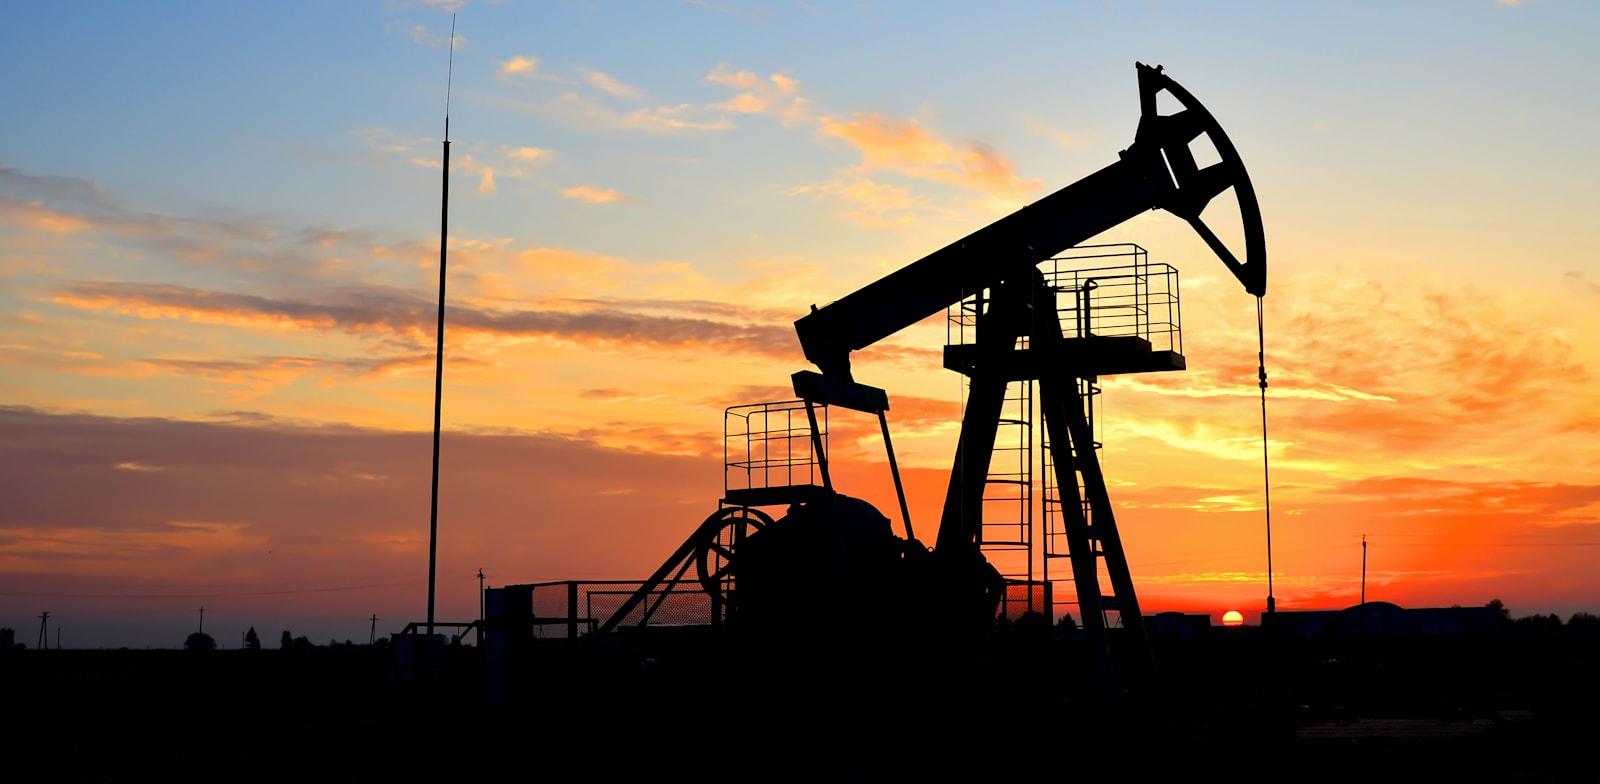 שדה נפט בבלארוס / צילום: Shutterstock, Maksim Safaniuk